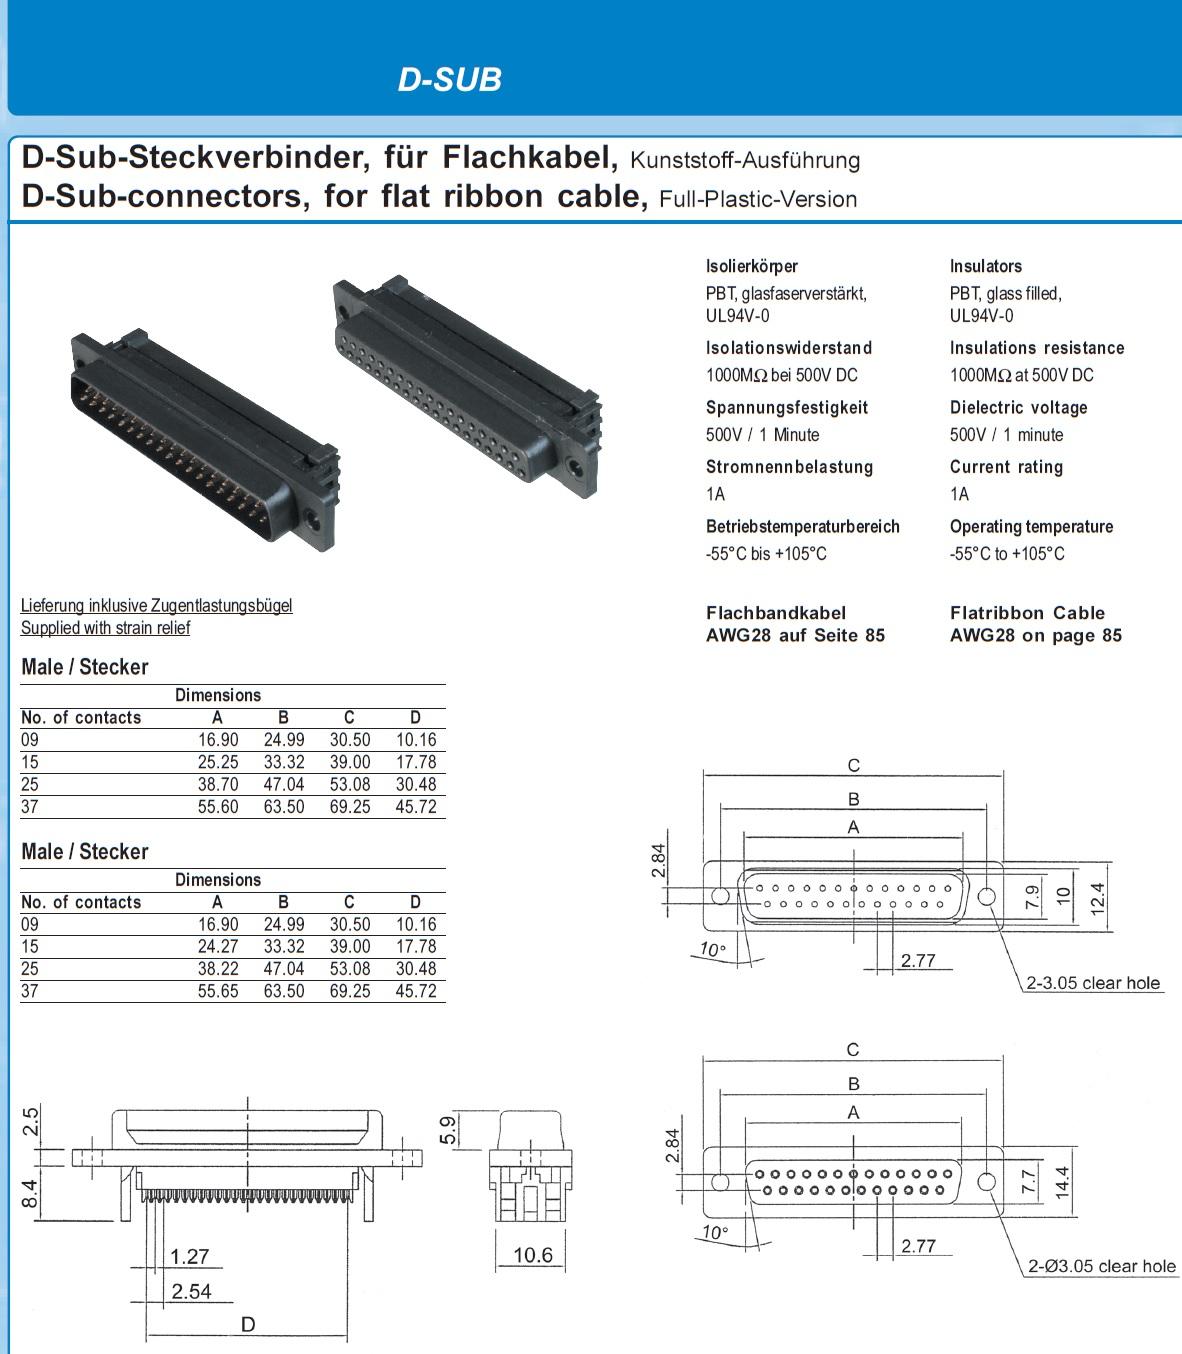 9473 26 poleribbon to 25 pole dsub connector female tech specs